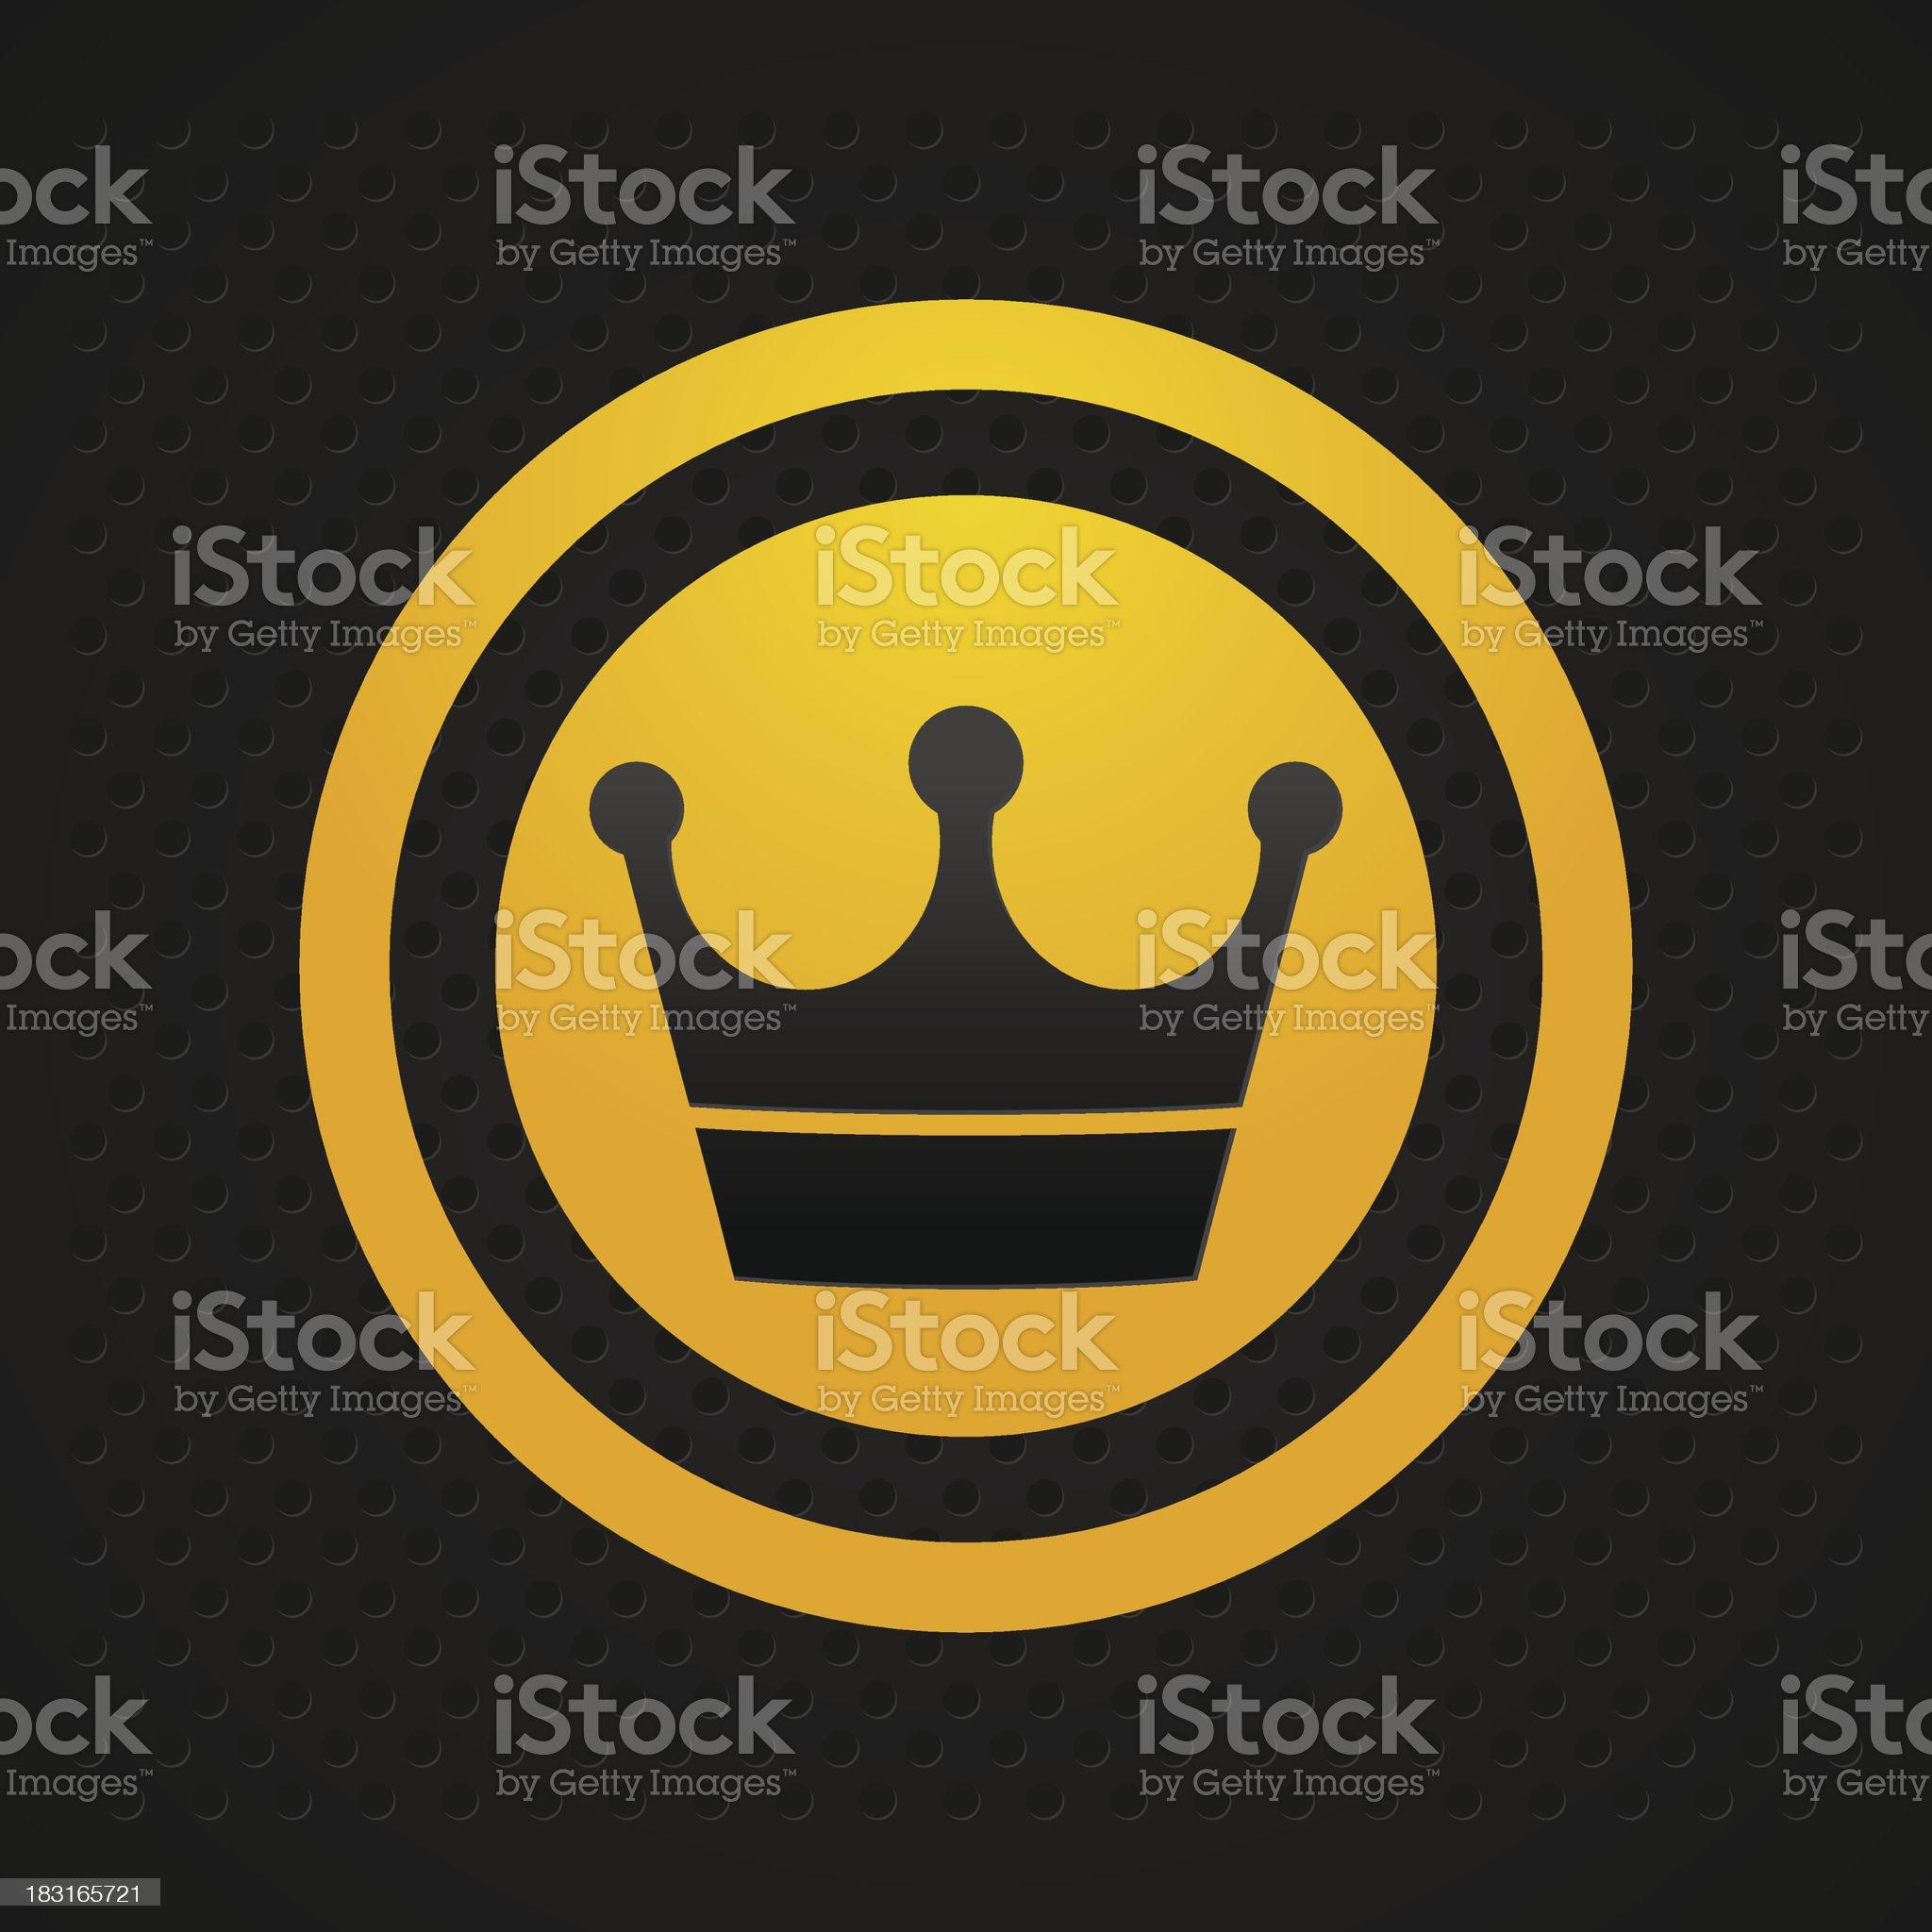 crown icon black royalty-free stock vector art